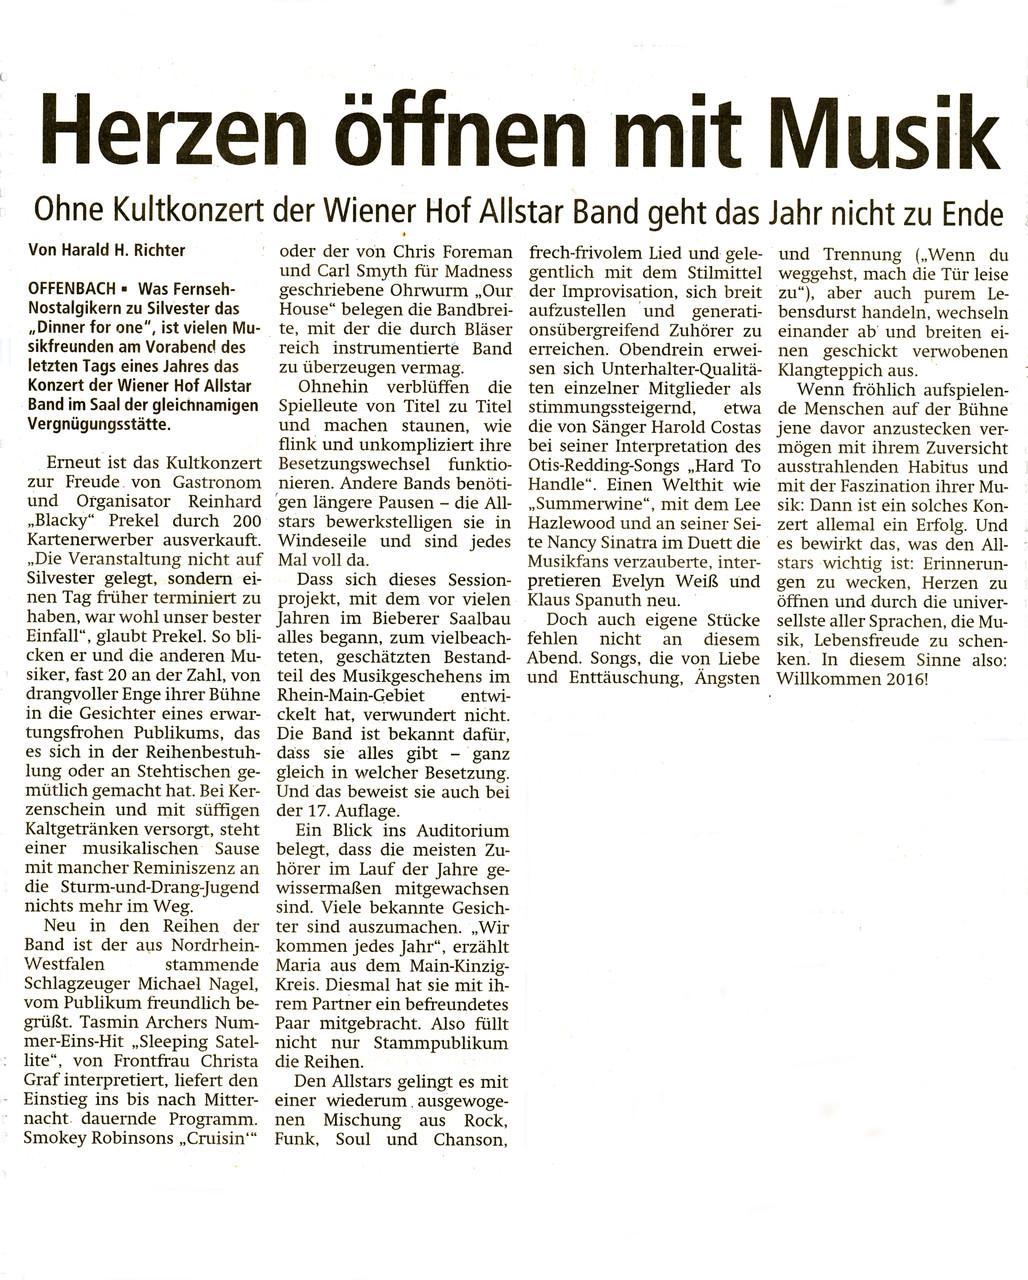 Offenbach Post, 2. Januar 2016